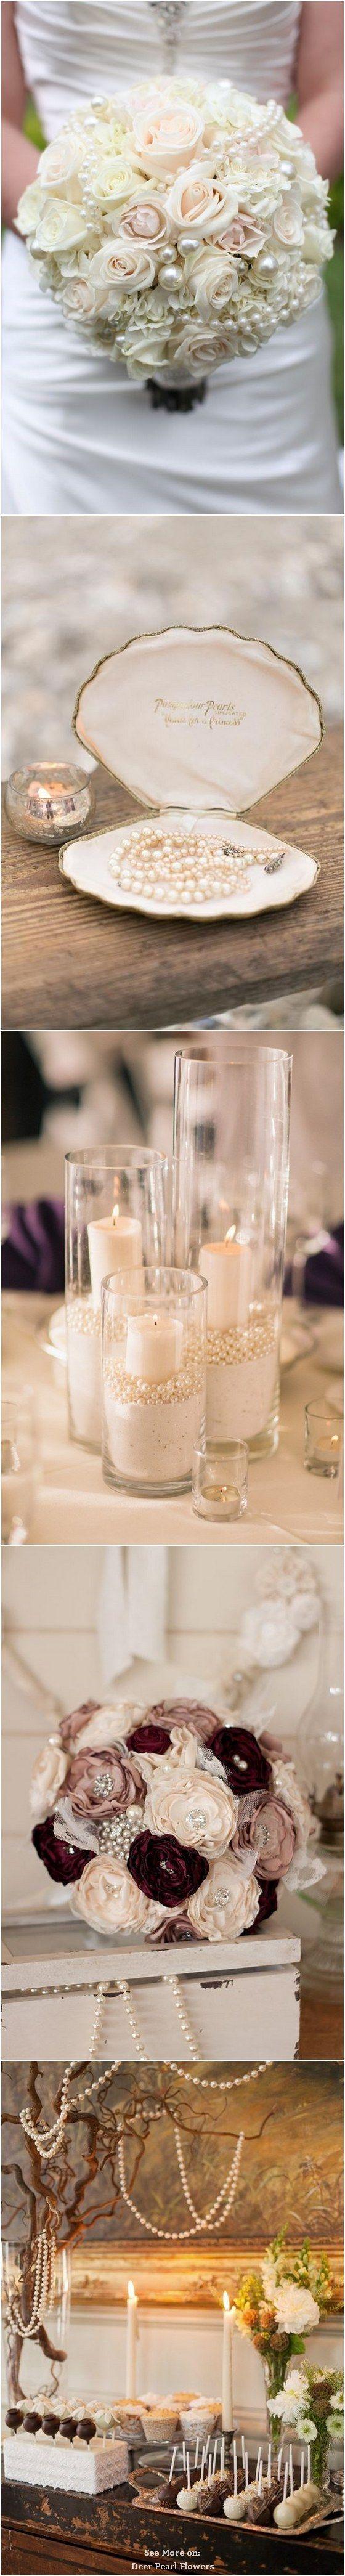 Vintage pearls wedding ideas and themes / http://www.deerpearlflowers.com/vintage-pearl-wedding-ideas/